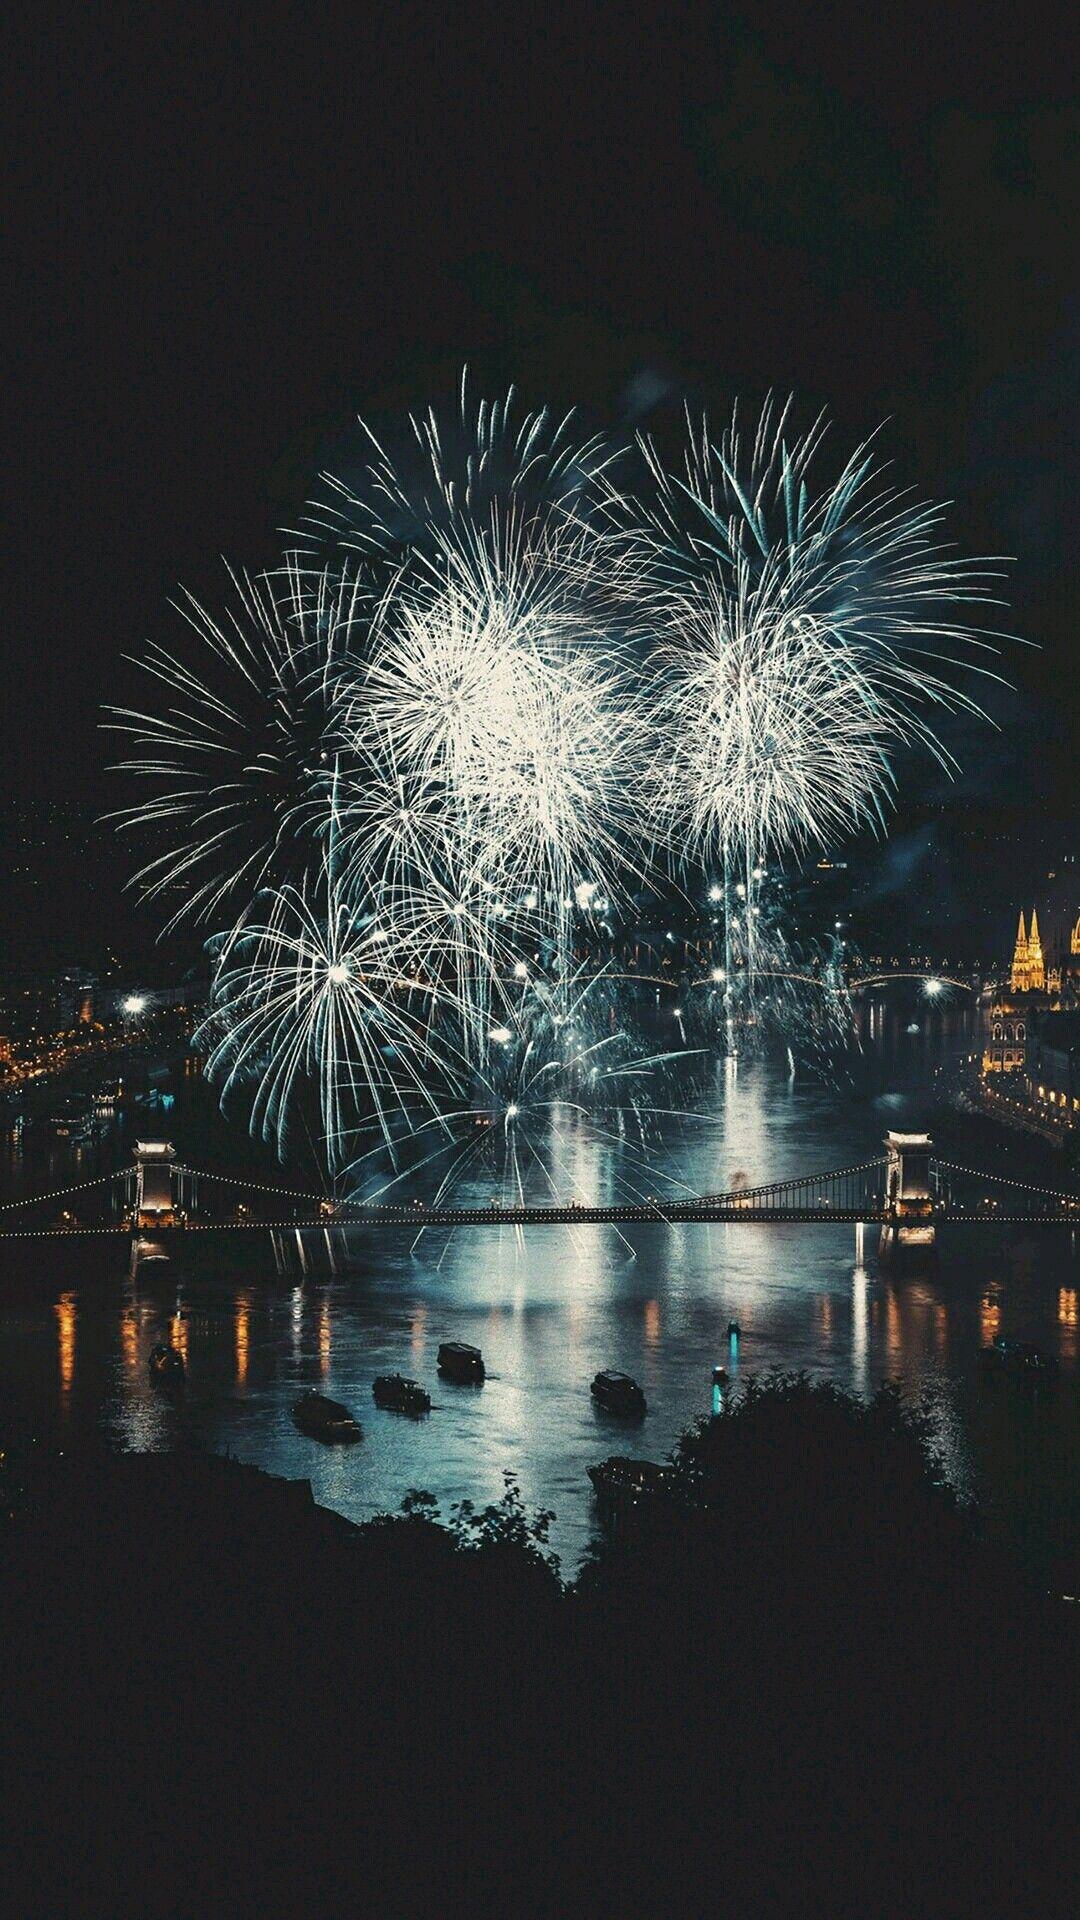 Pin by Sandye Gallatin on Fireworks  Fireworks, New year